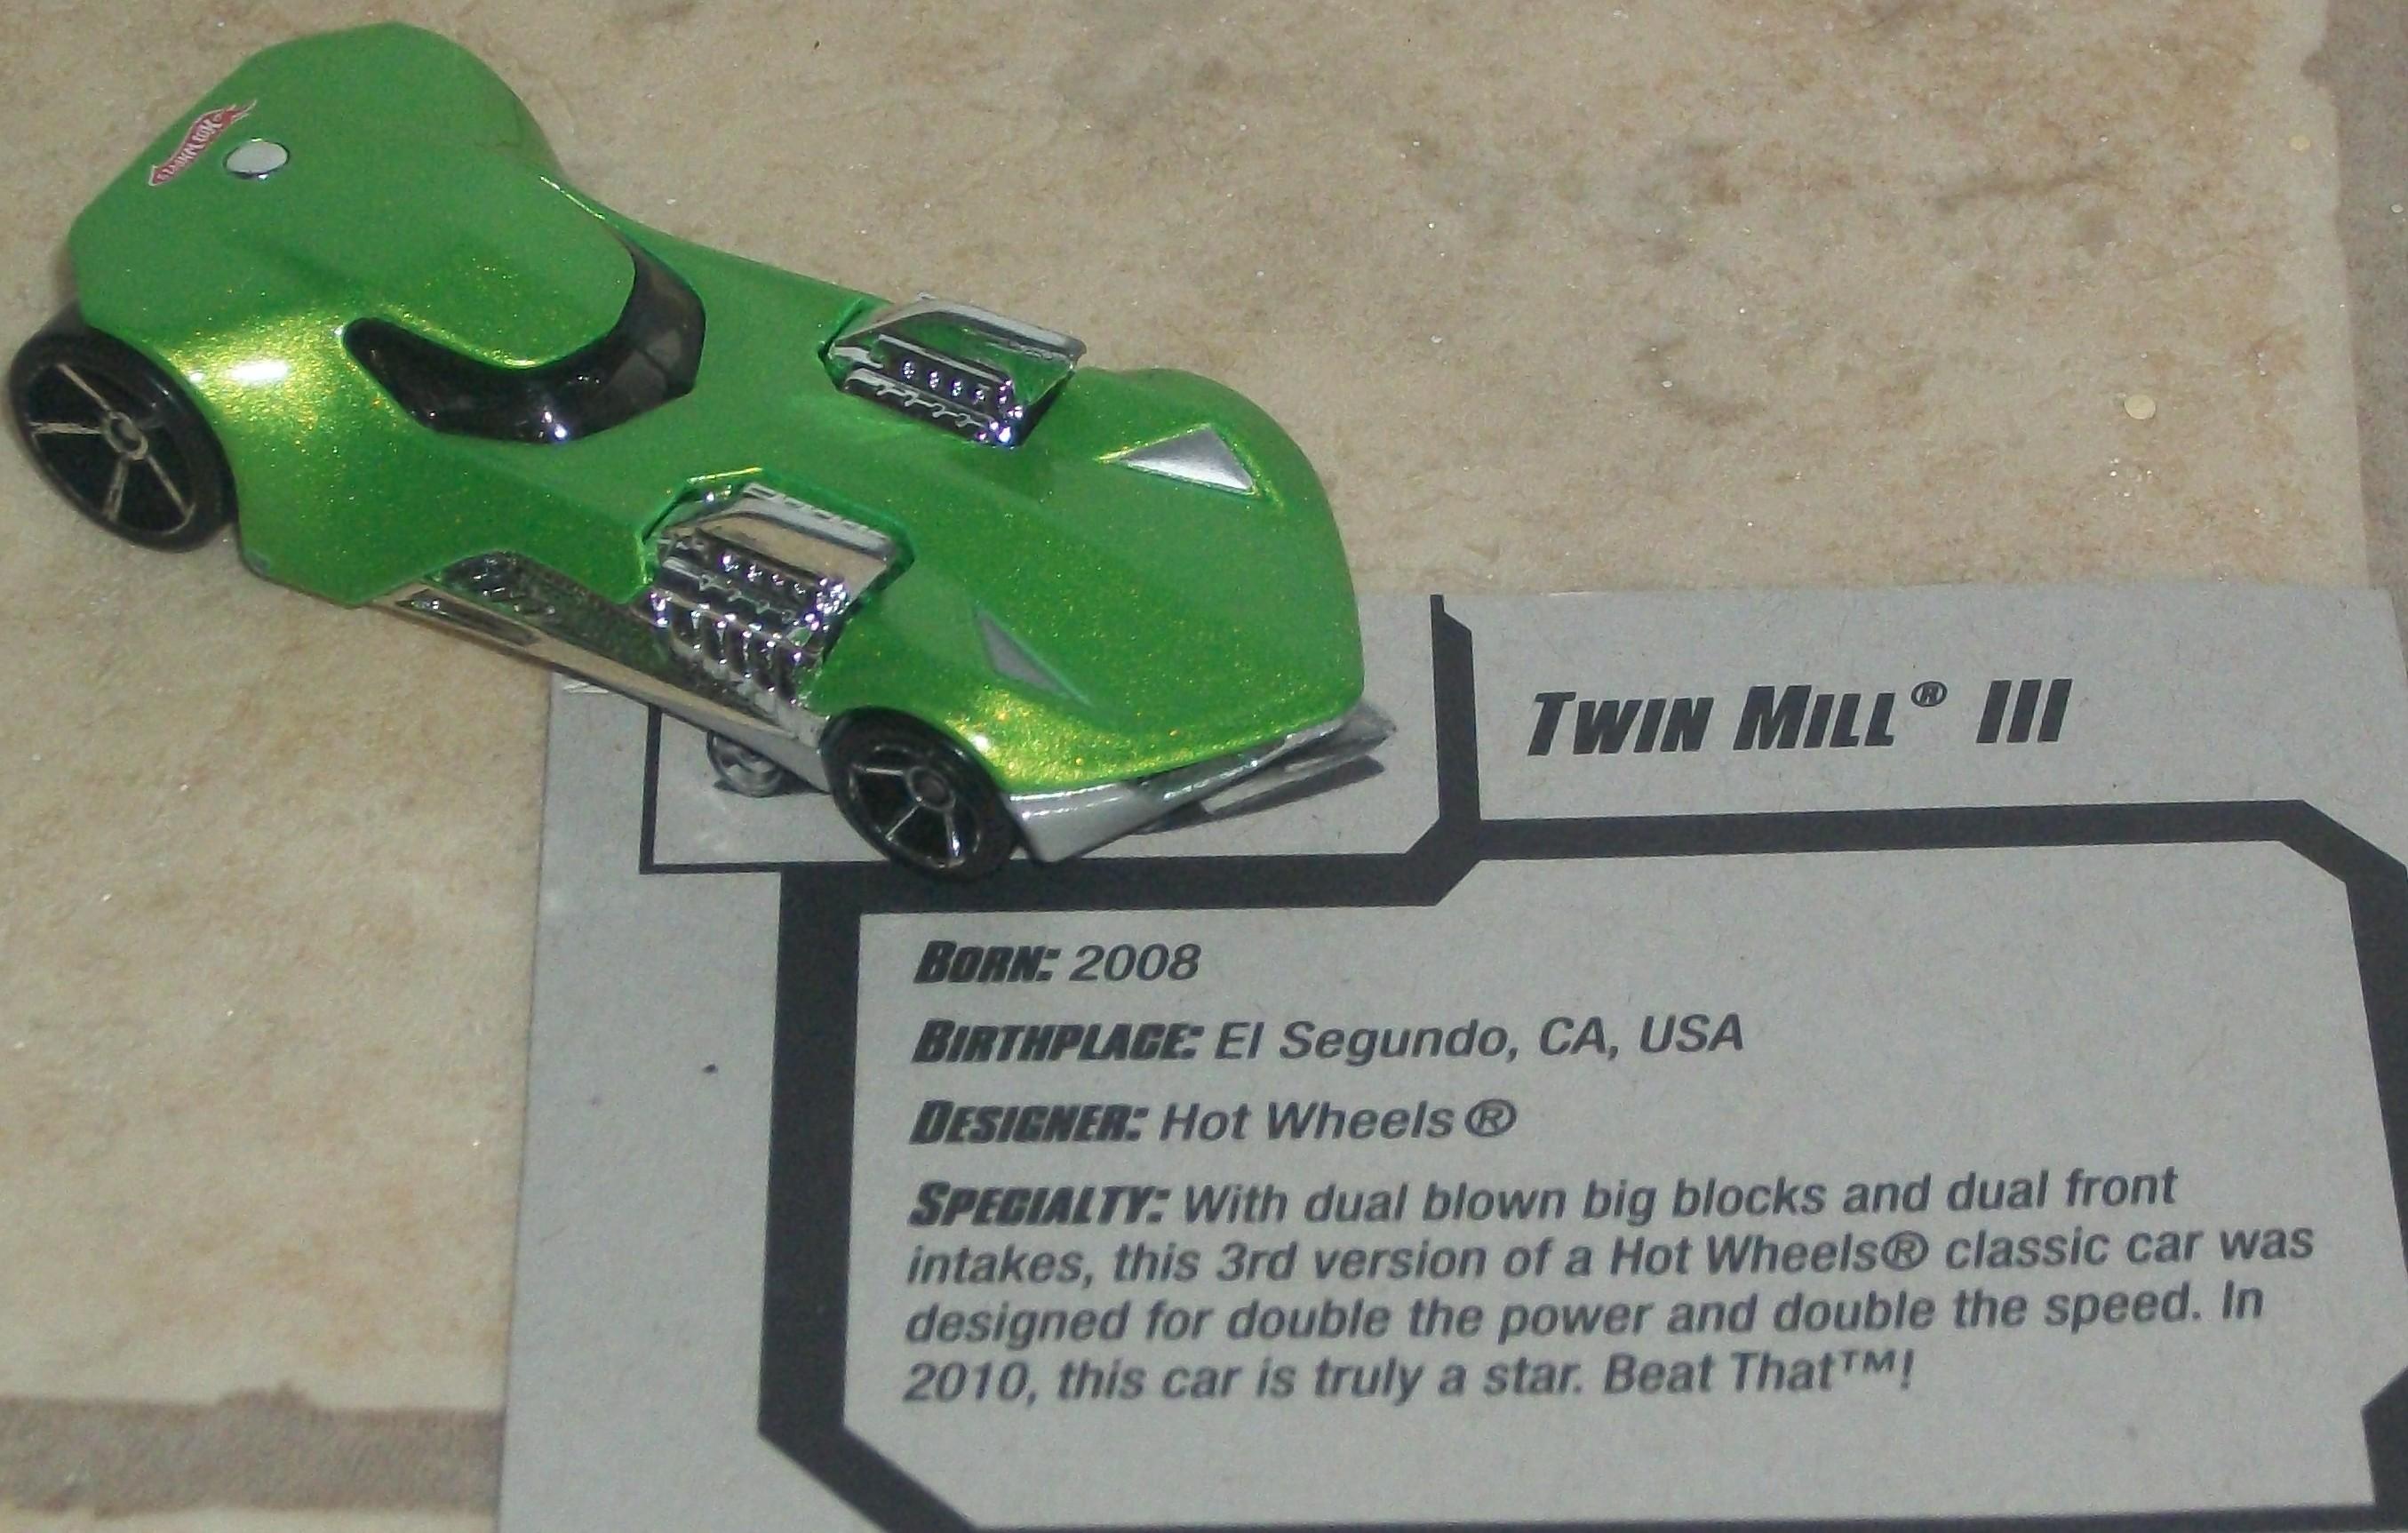 Twin Mill III